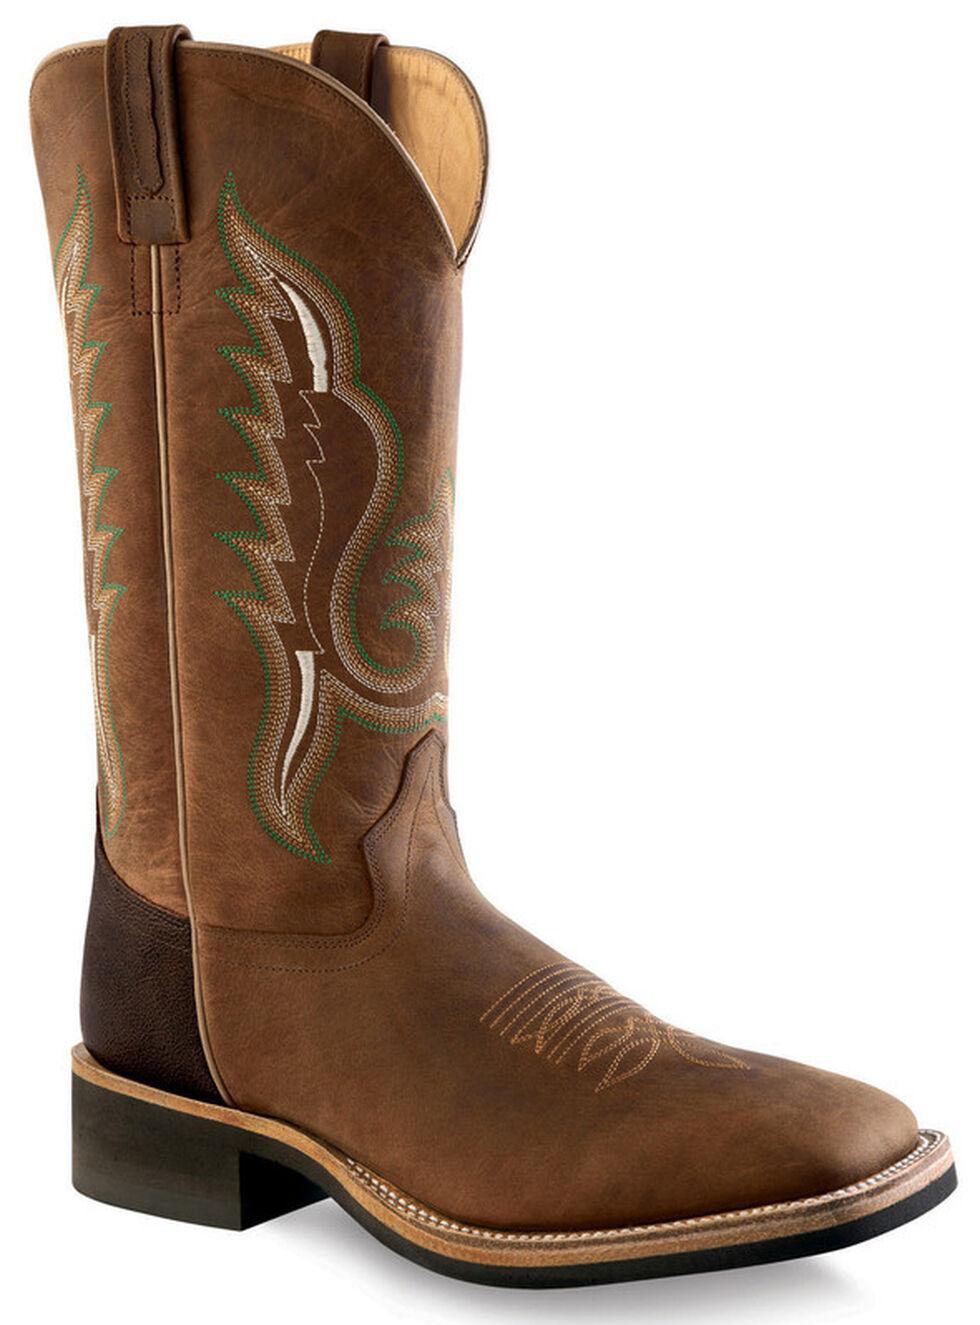 Old West Men's Brown Cowboy Boots - Square Toe , Brown, hi-res